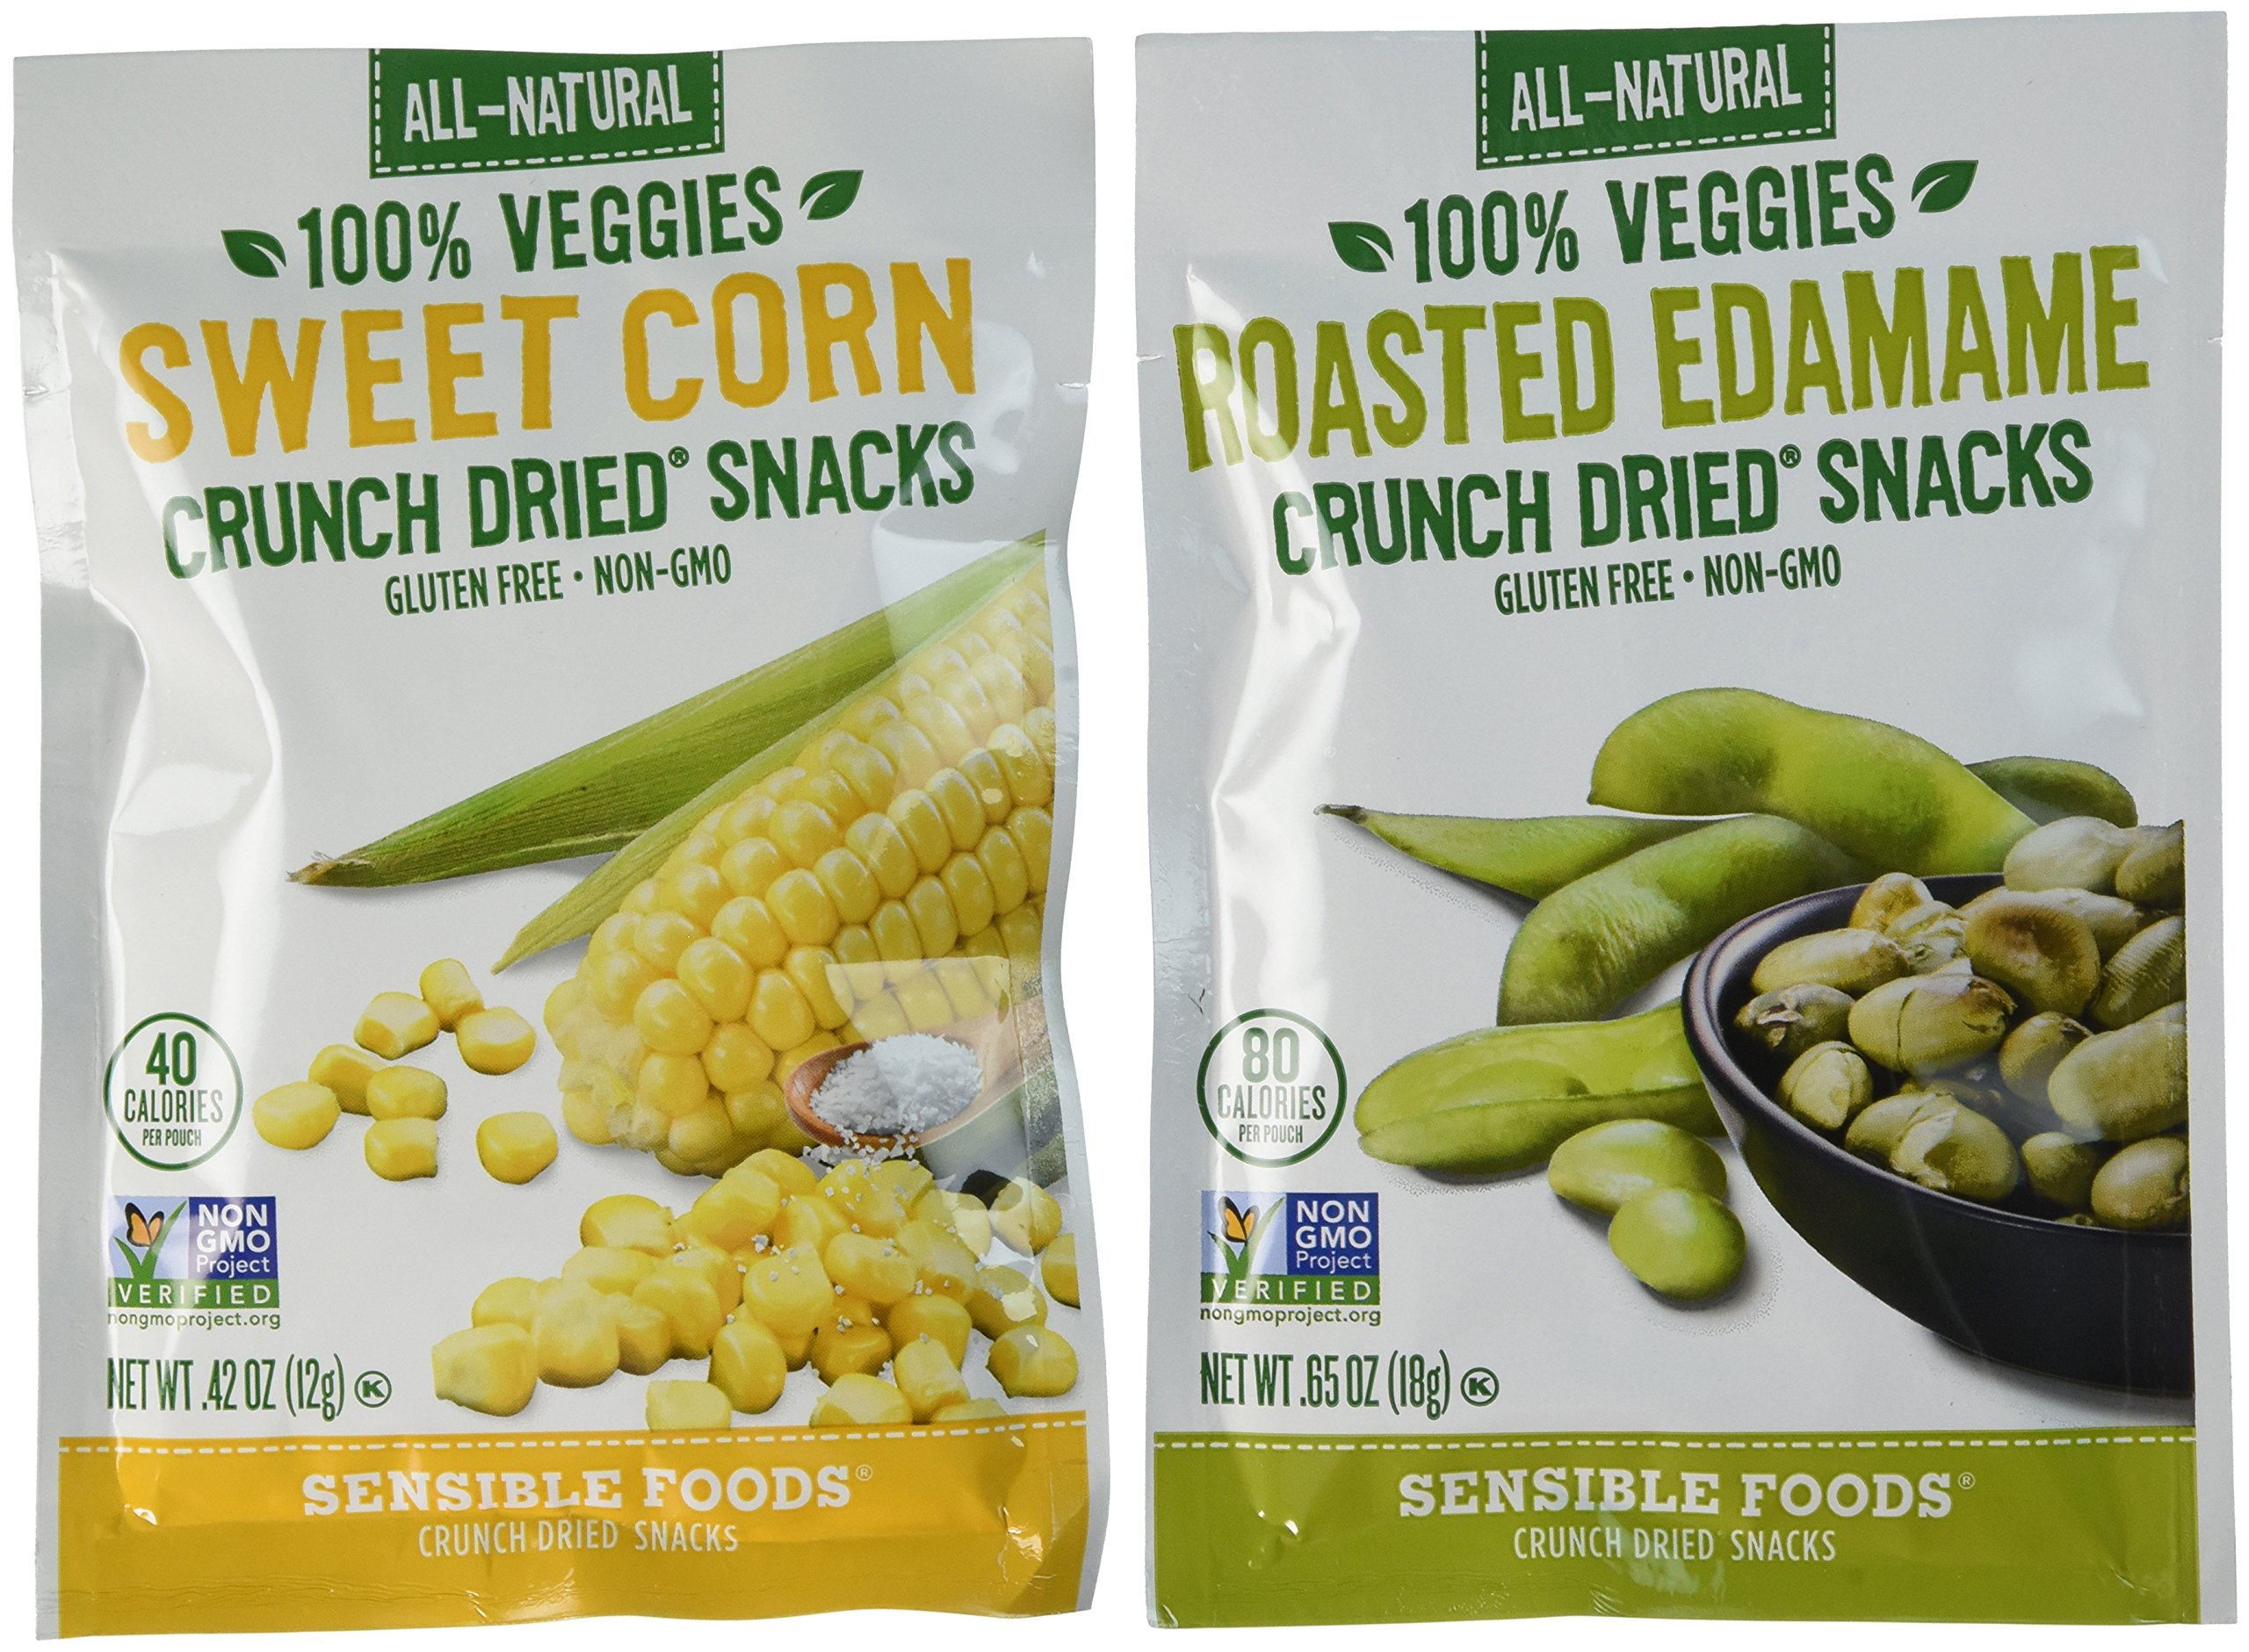 Sensible Foods Veggie Variety Pack, Corn/Edamame, 20 Count